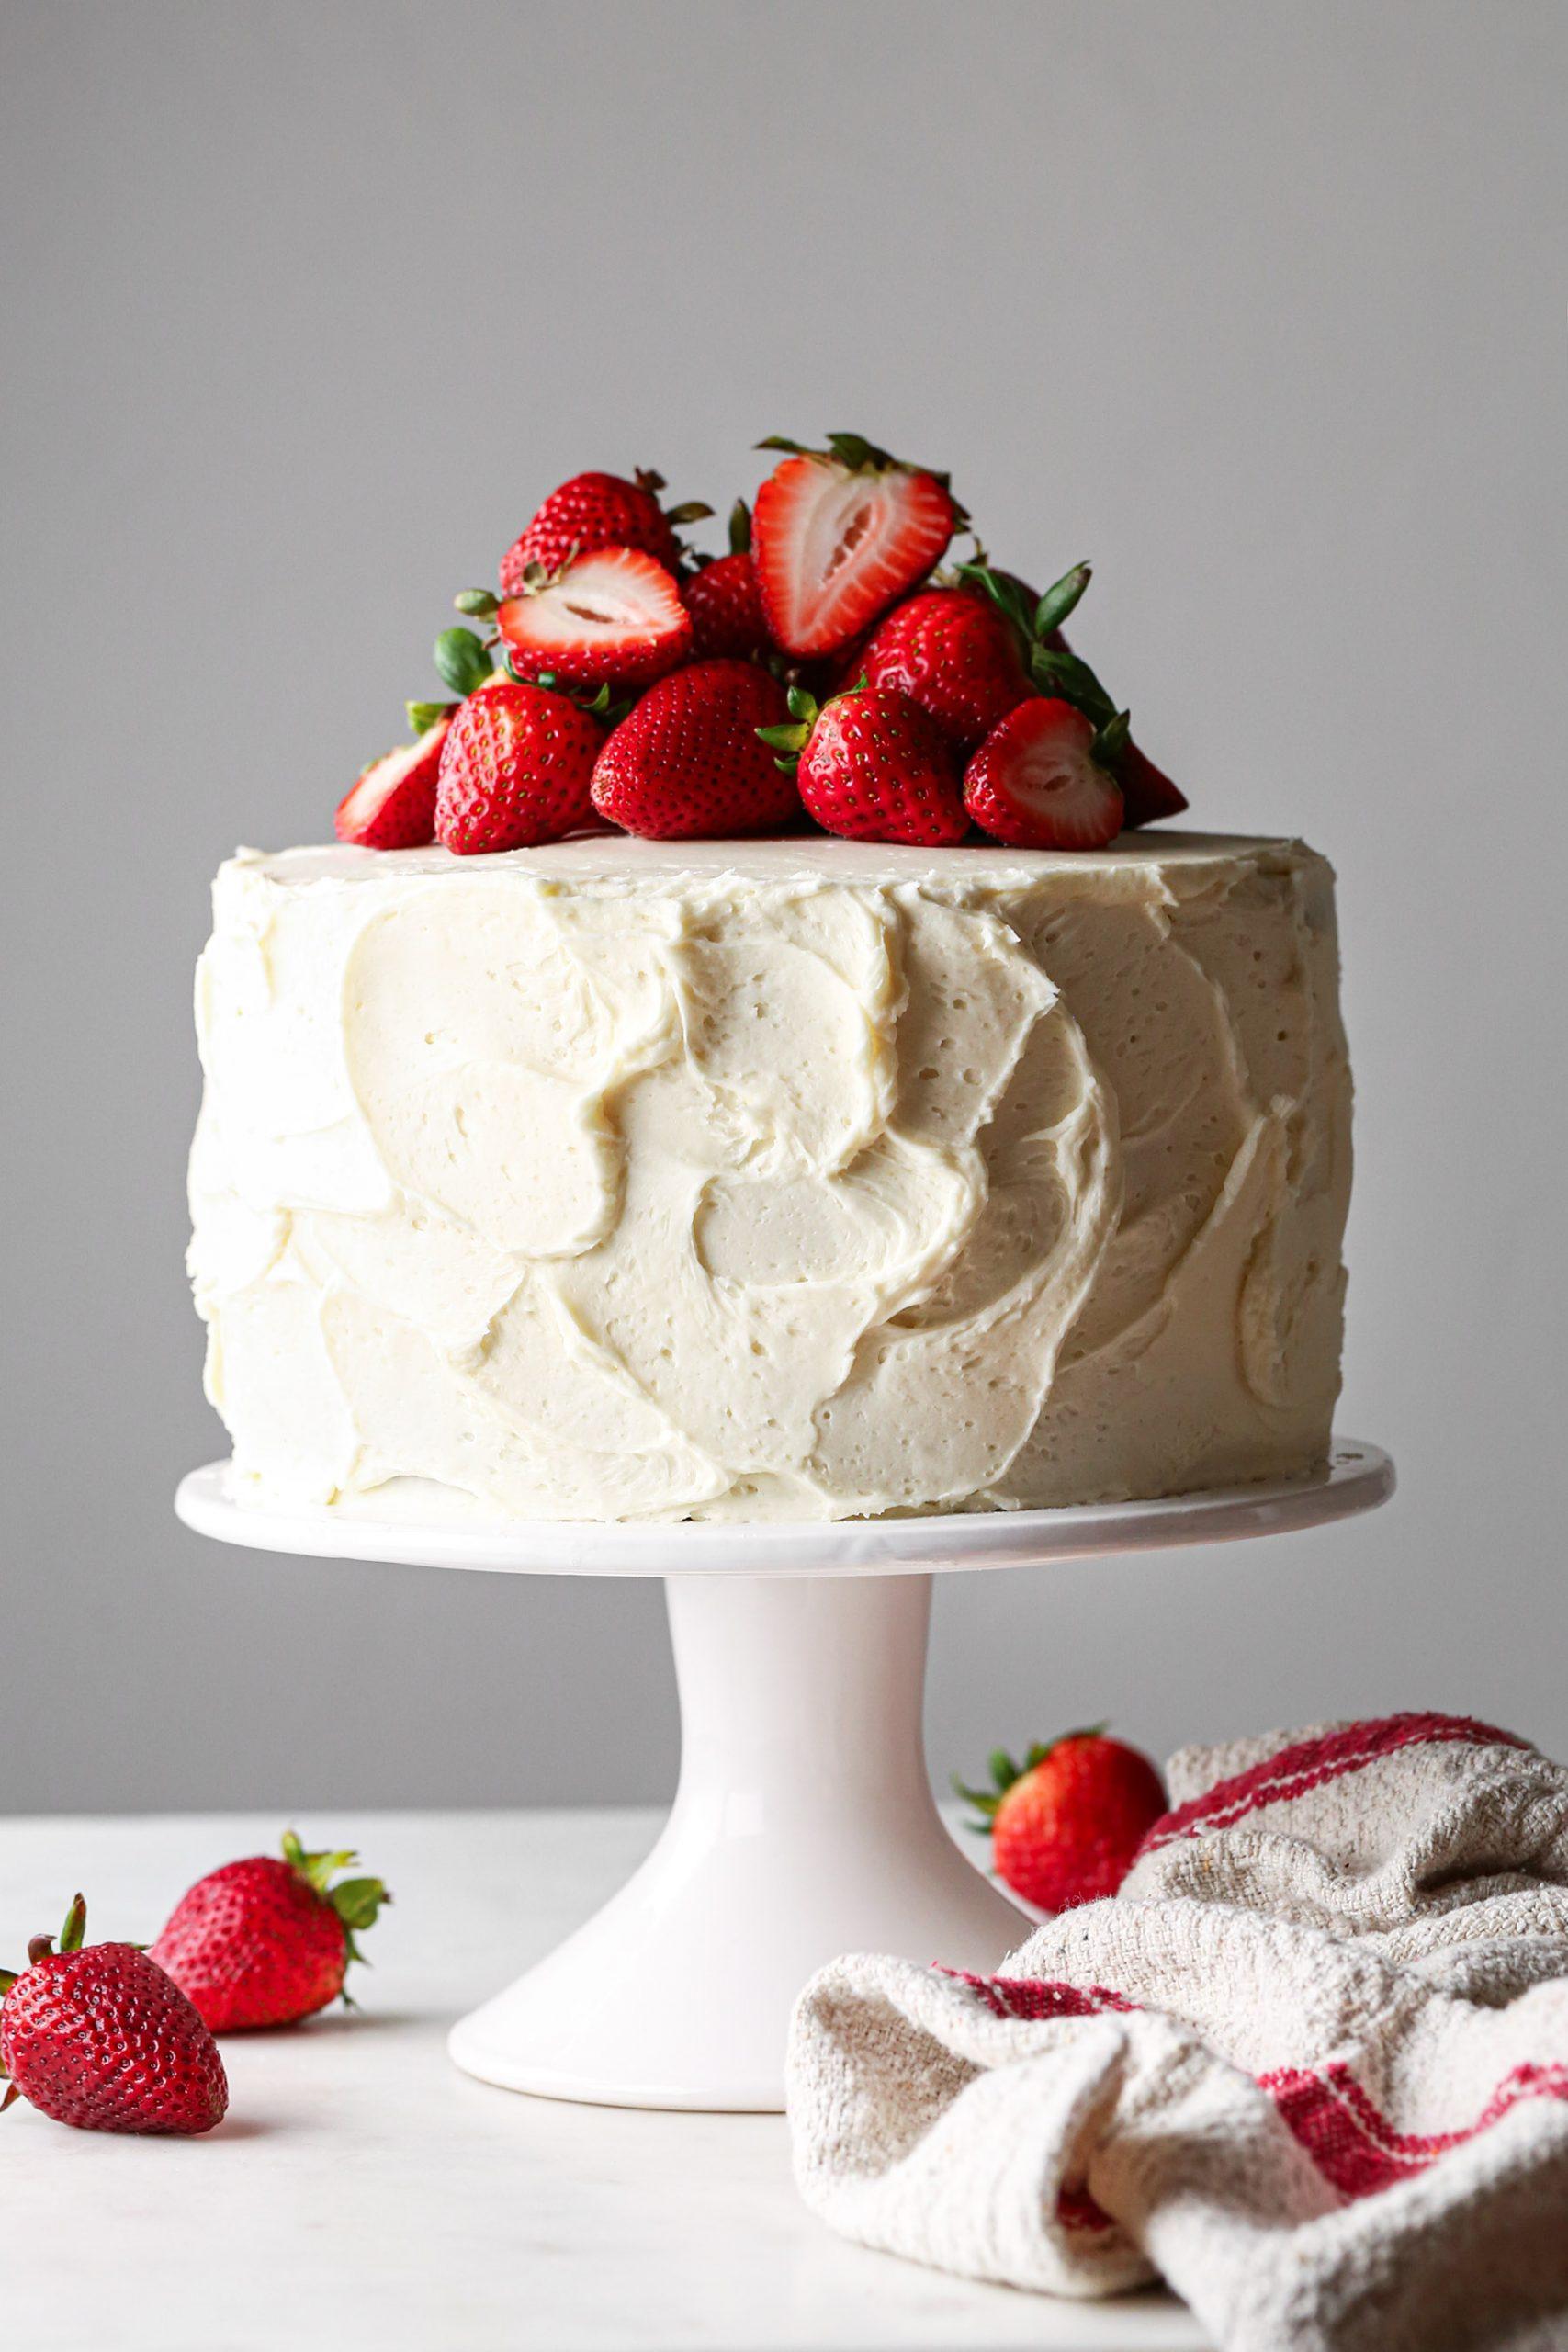 Neapolitan cake with vanilla buttercream and fresh strawberries on top